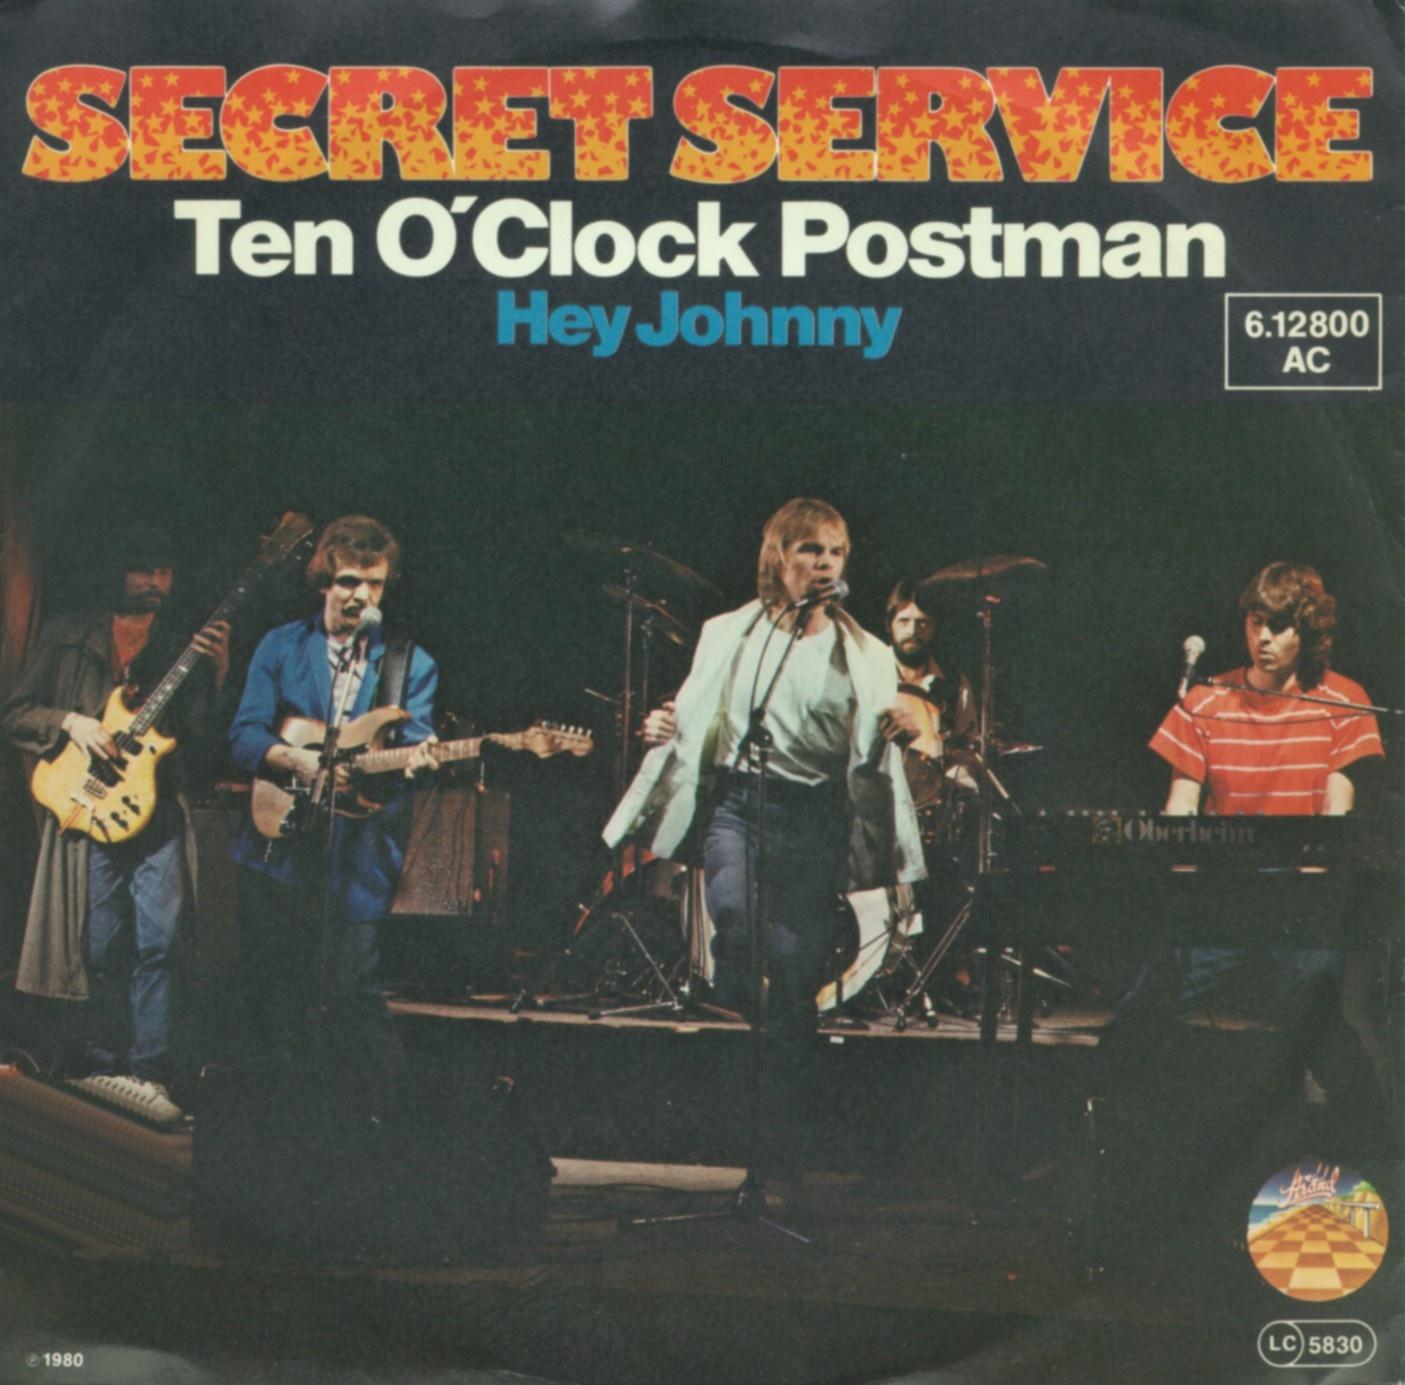 Ten o'clock postman (Foto: Secret Service)